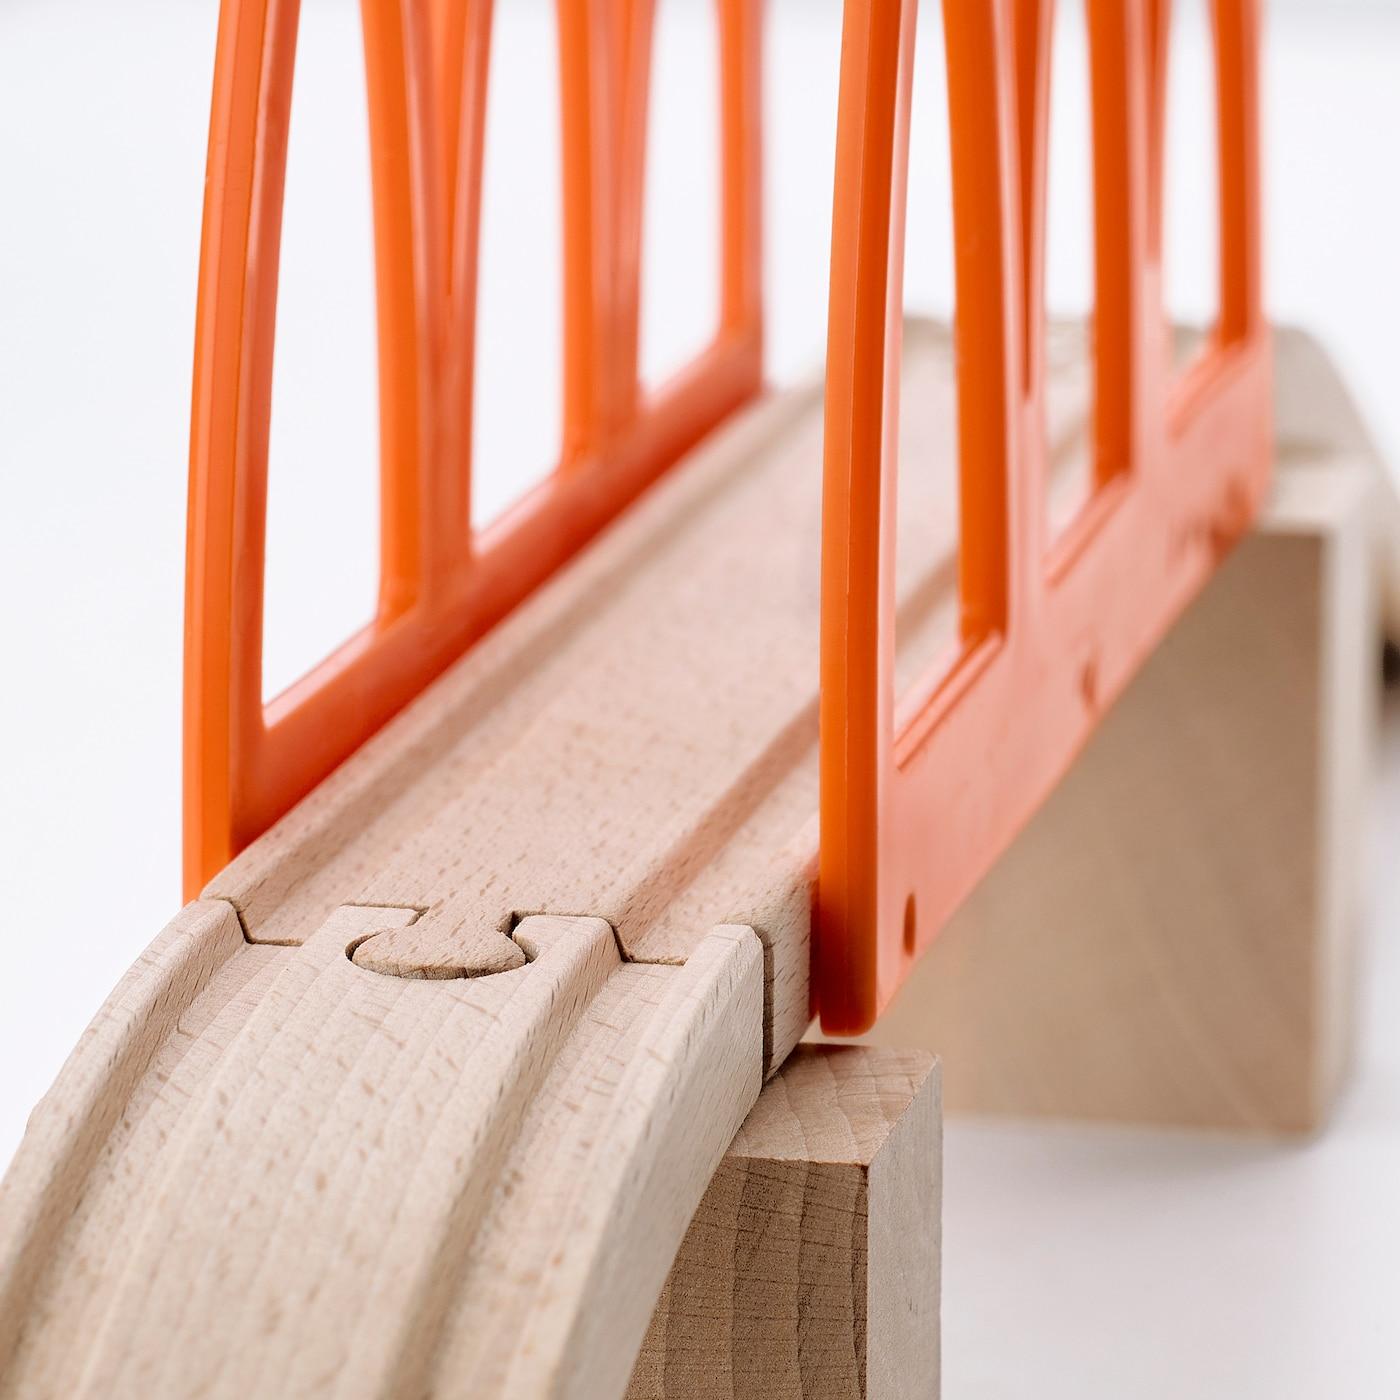 LILLABO Brücken-Set 5-tlg. für Eisenbahn